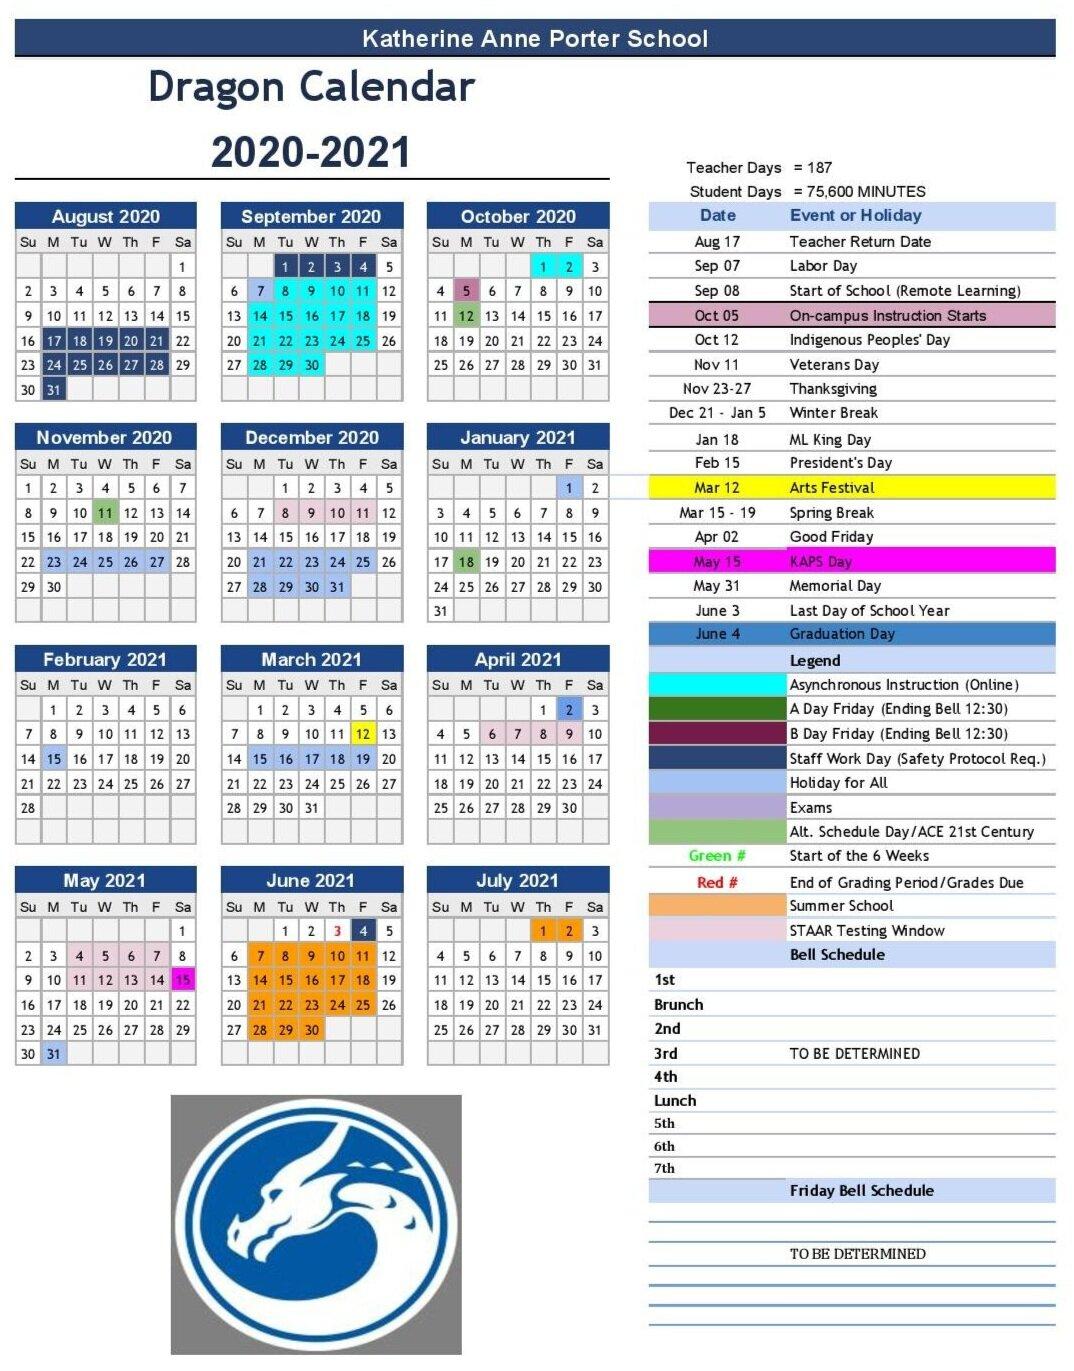 2020-2021 Calendar — Katherine Anne Porter School